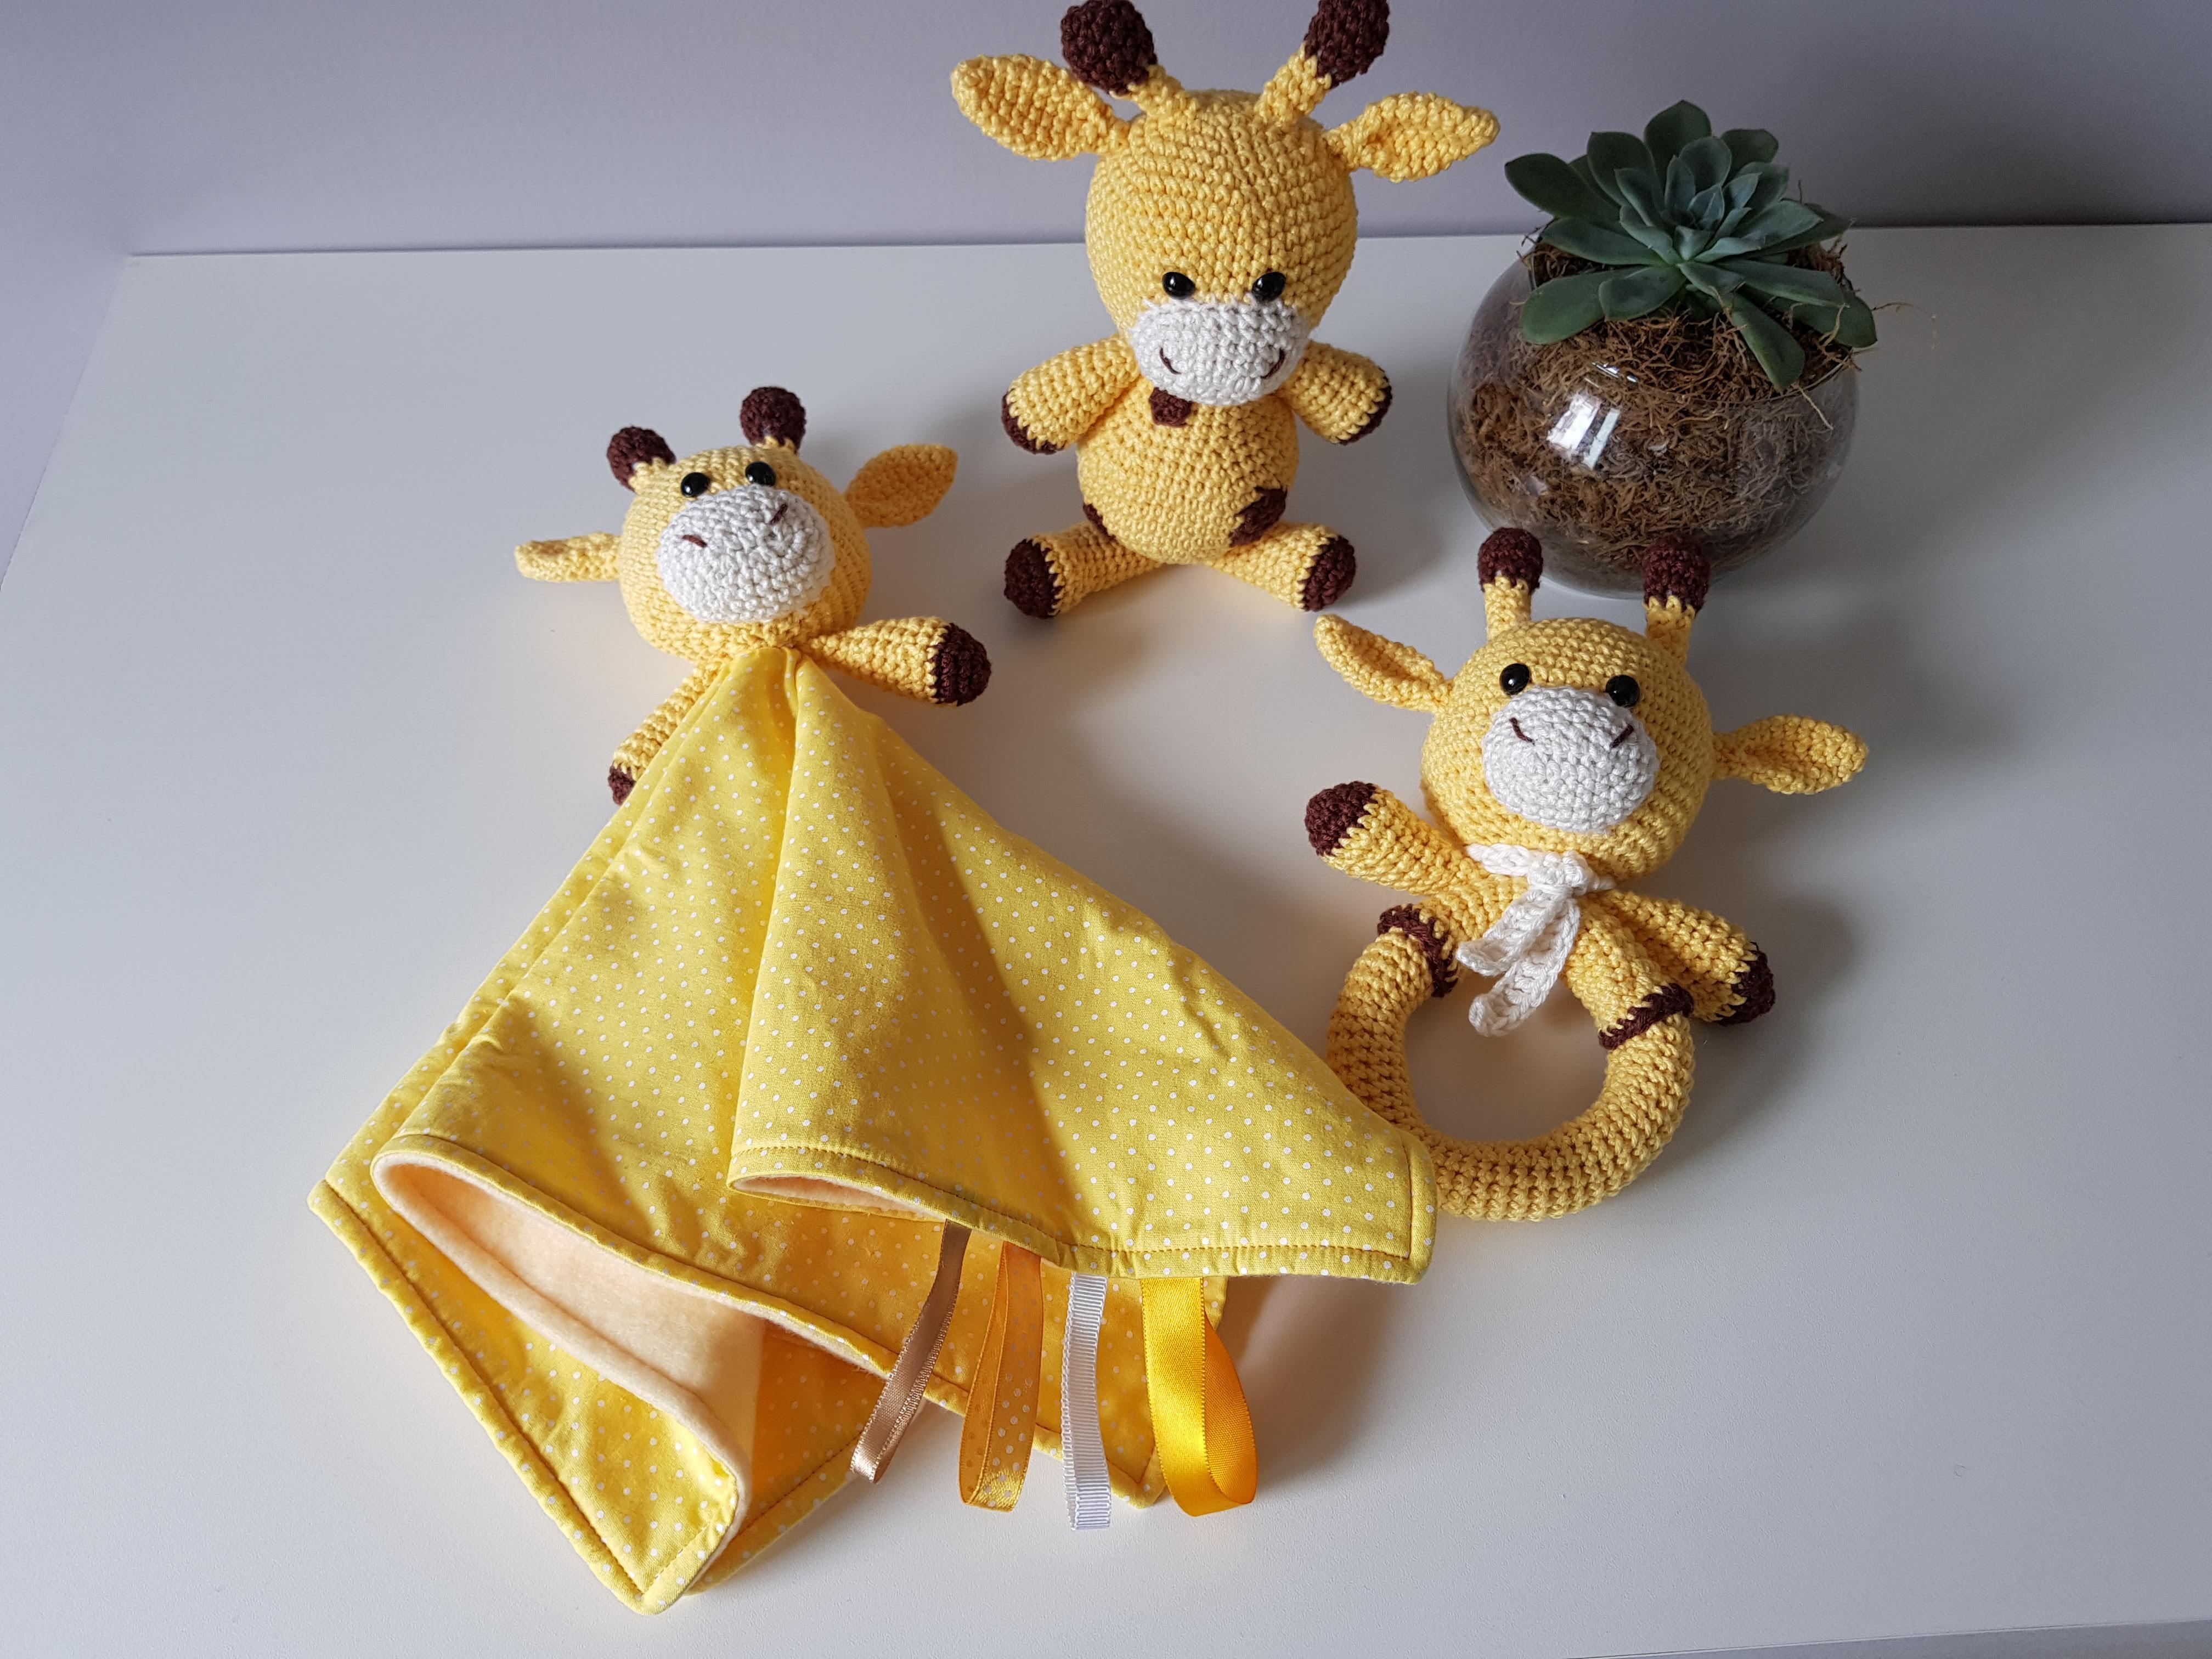 Hearty Giraffe amigurumi pattern - Amigurumi Today | 3024x4032